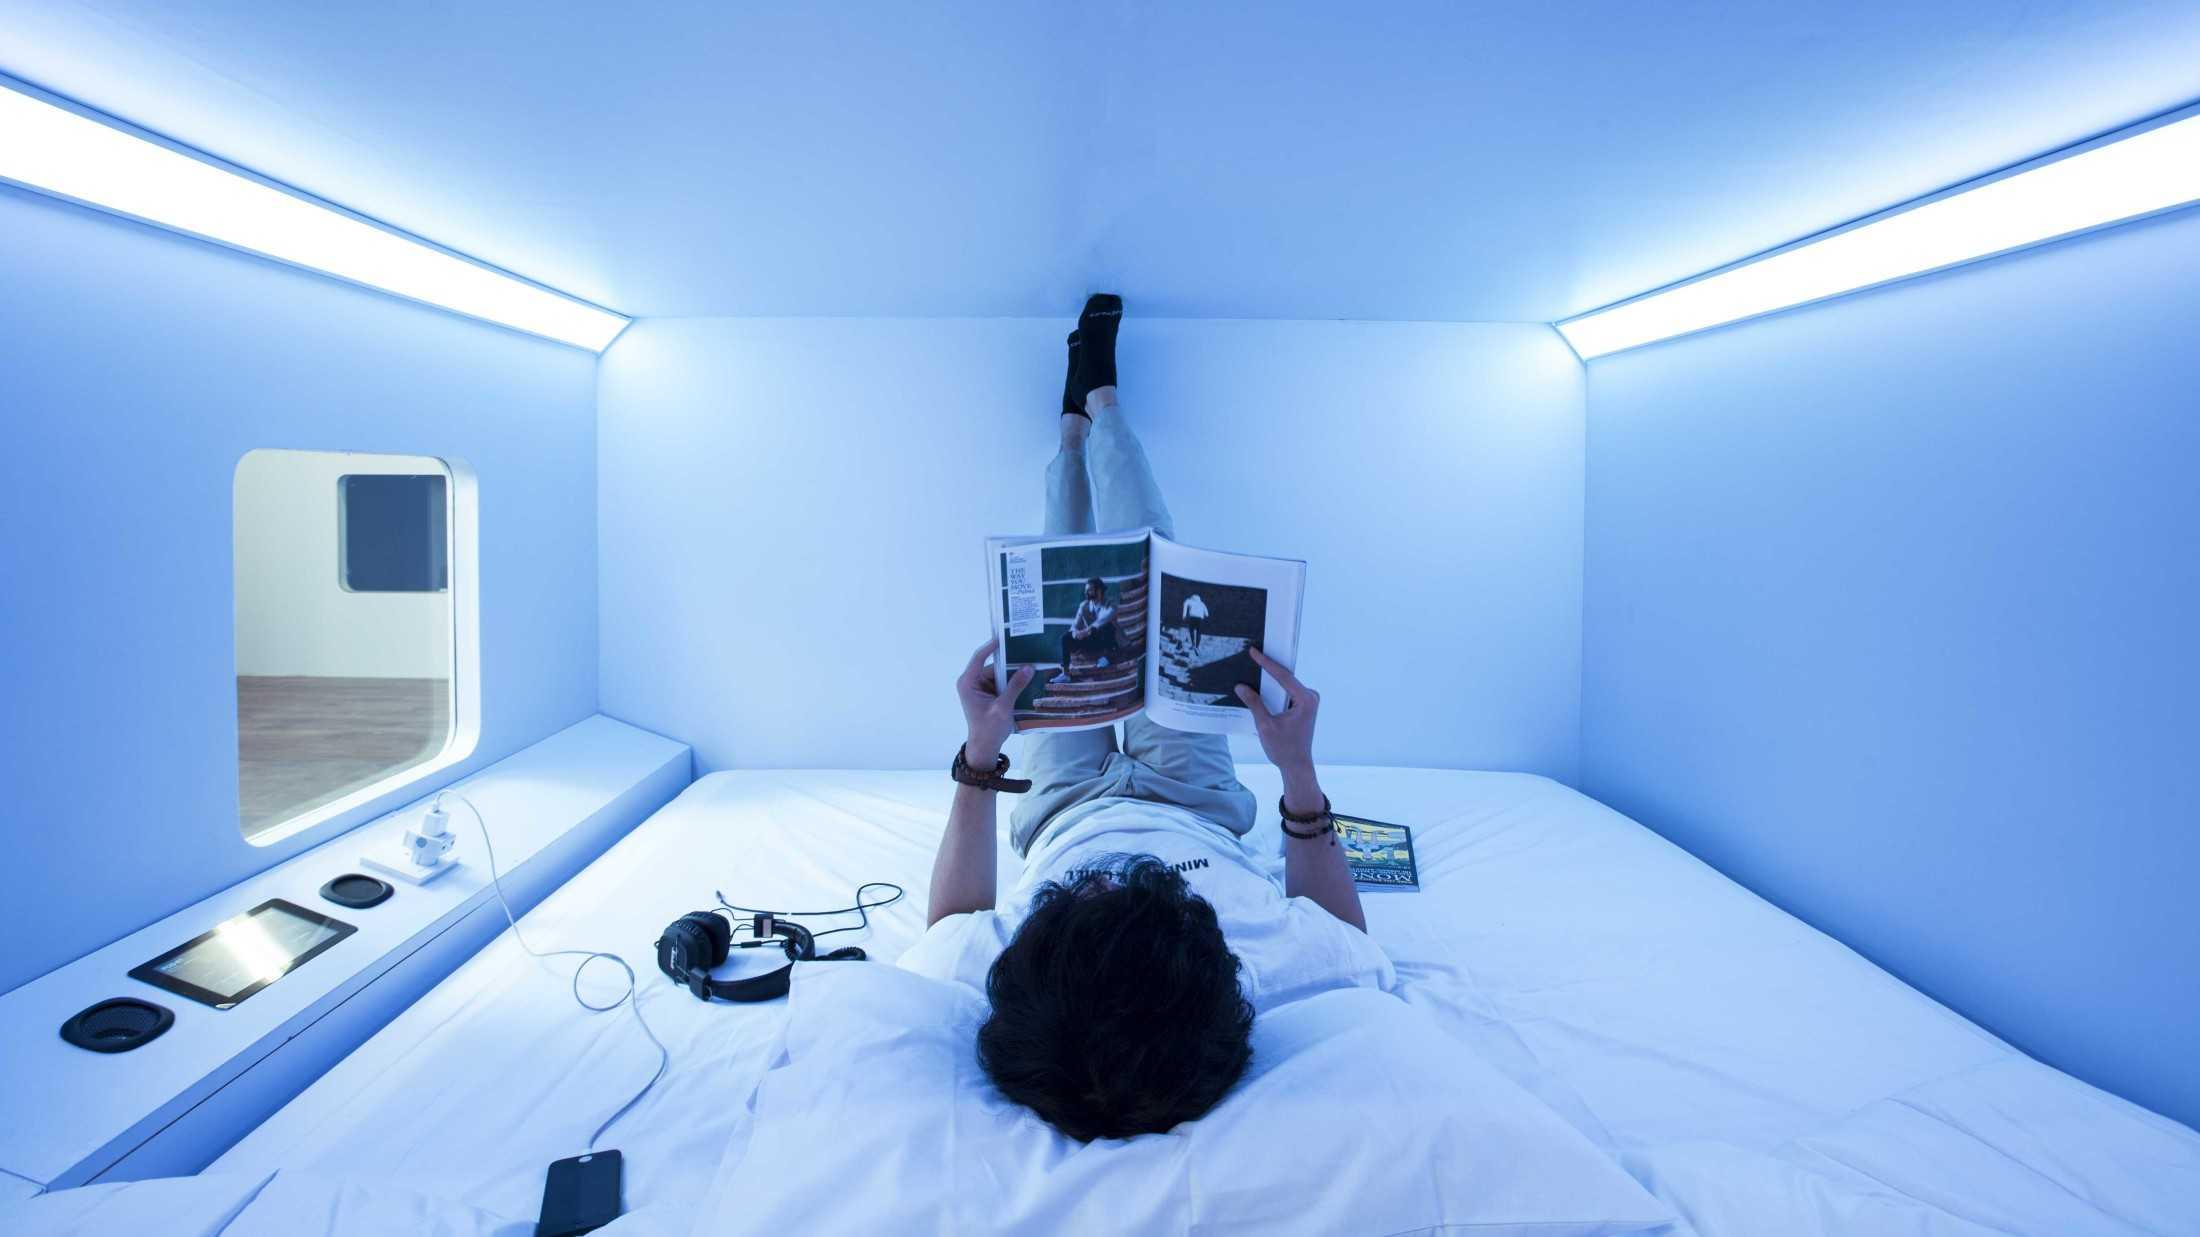 Smart Hotel dengan teknologi terkini (Sumber: arsitag.com)